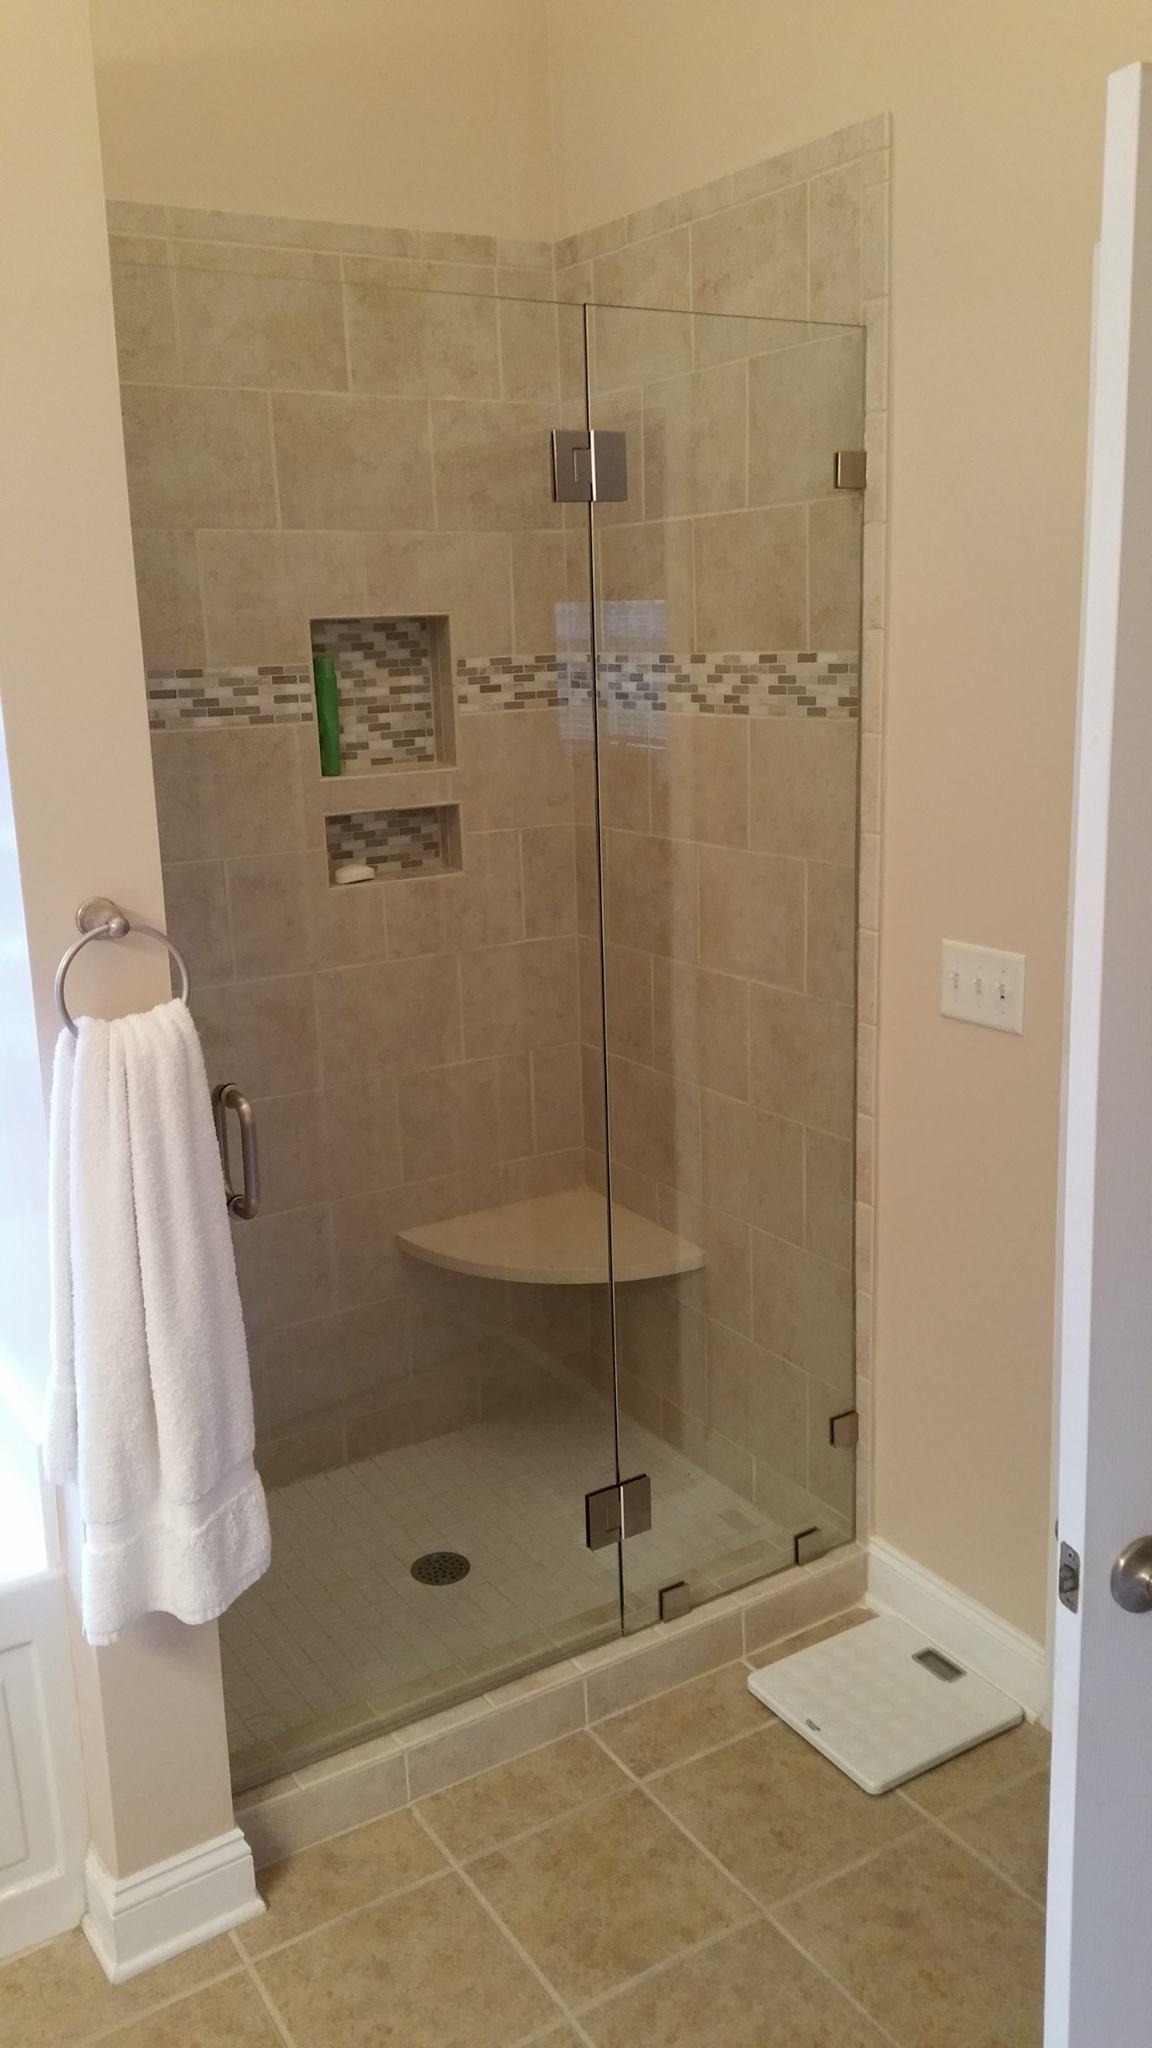 Frameless Shower Doors in Hampstead, NC | Registers Auto Glass